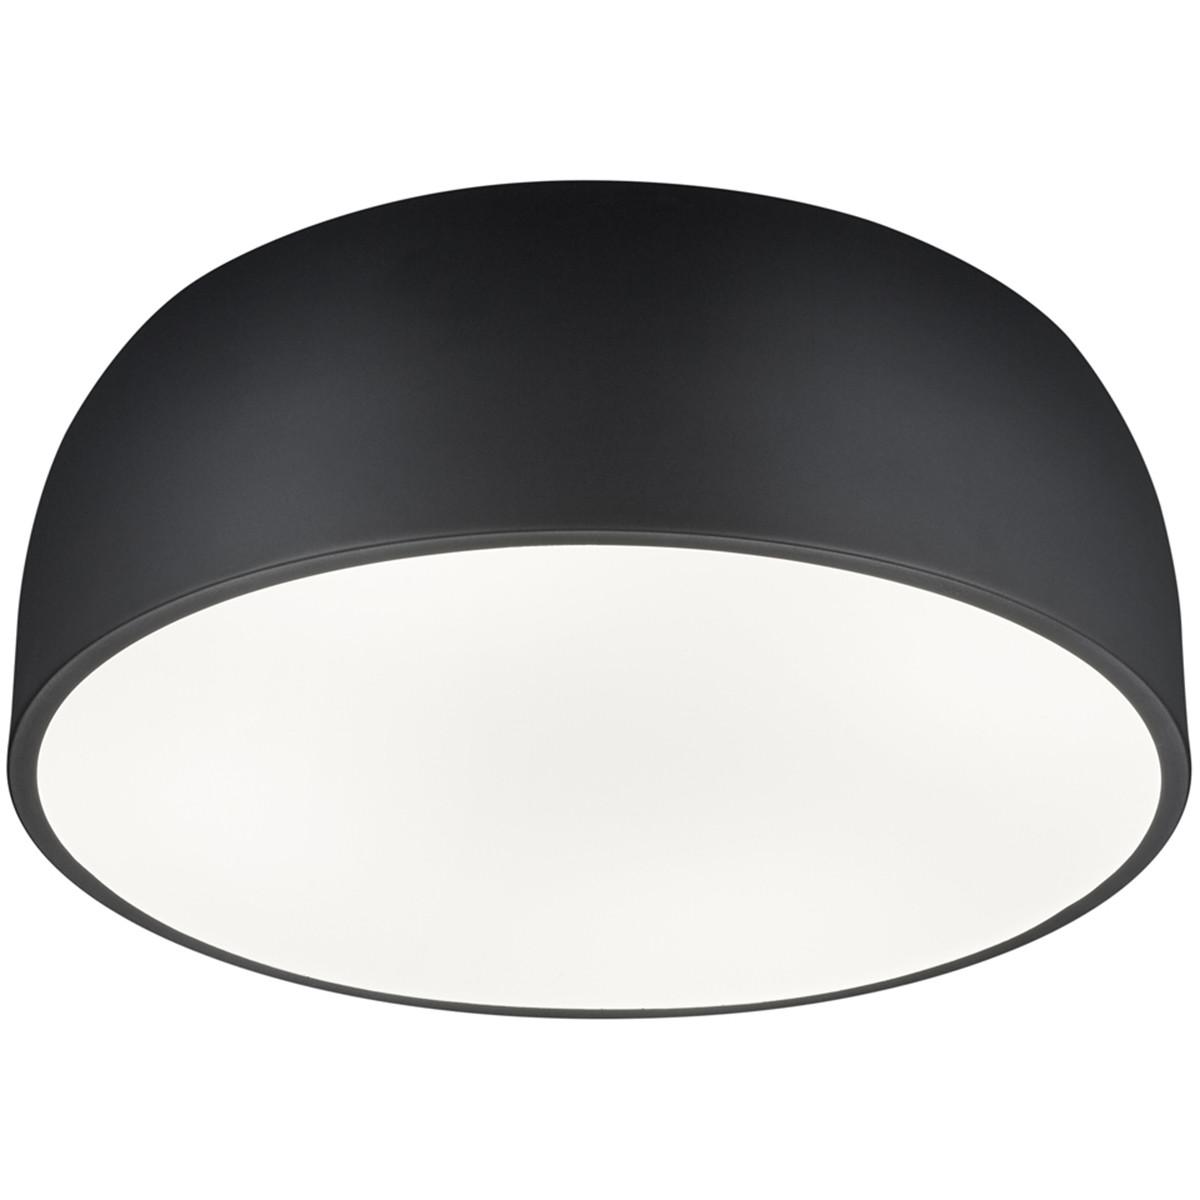 LED Plafondlamp - Plafondverlichting - Trion Barnon - E27 Fitting - 4-lichts - Rond - Mat Zwart - Al